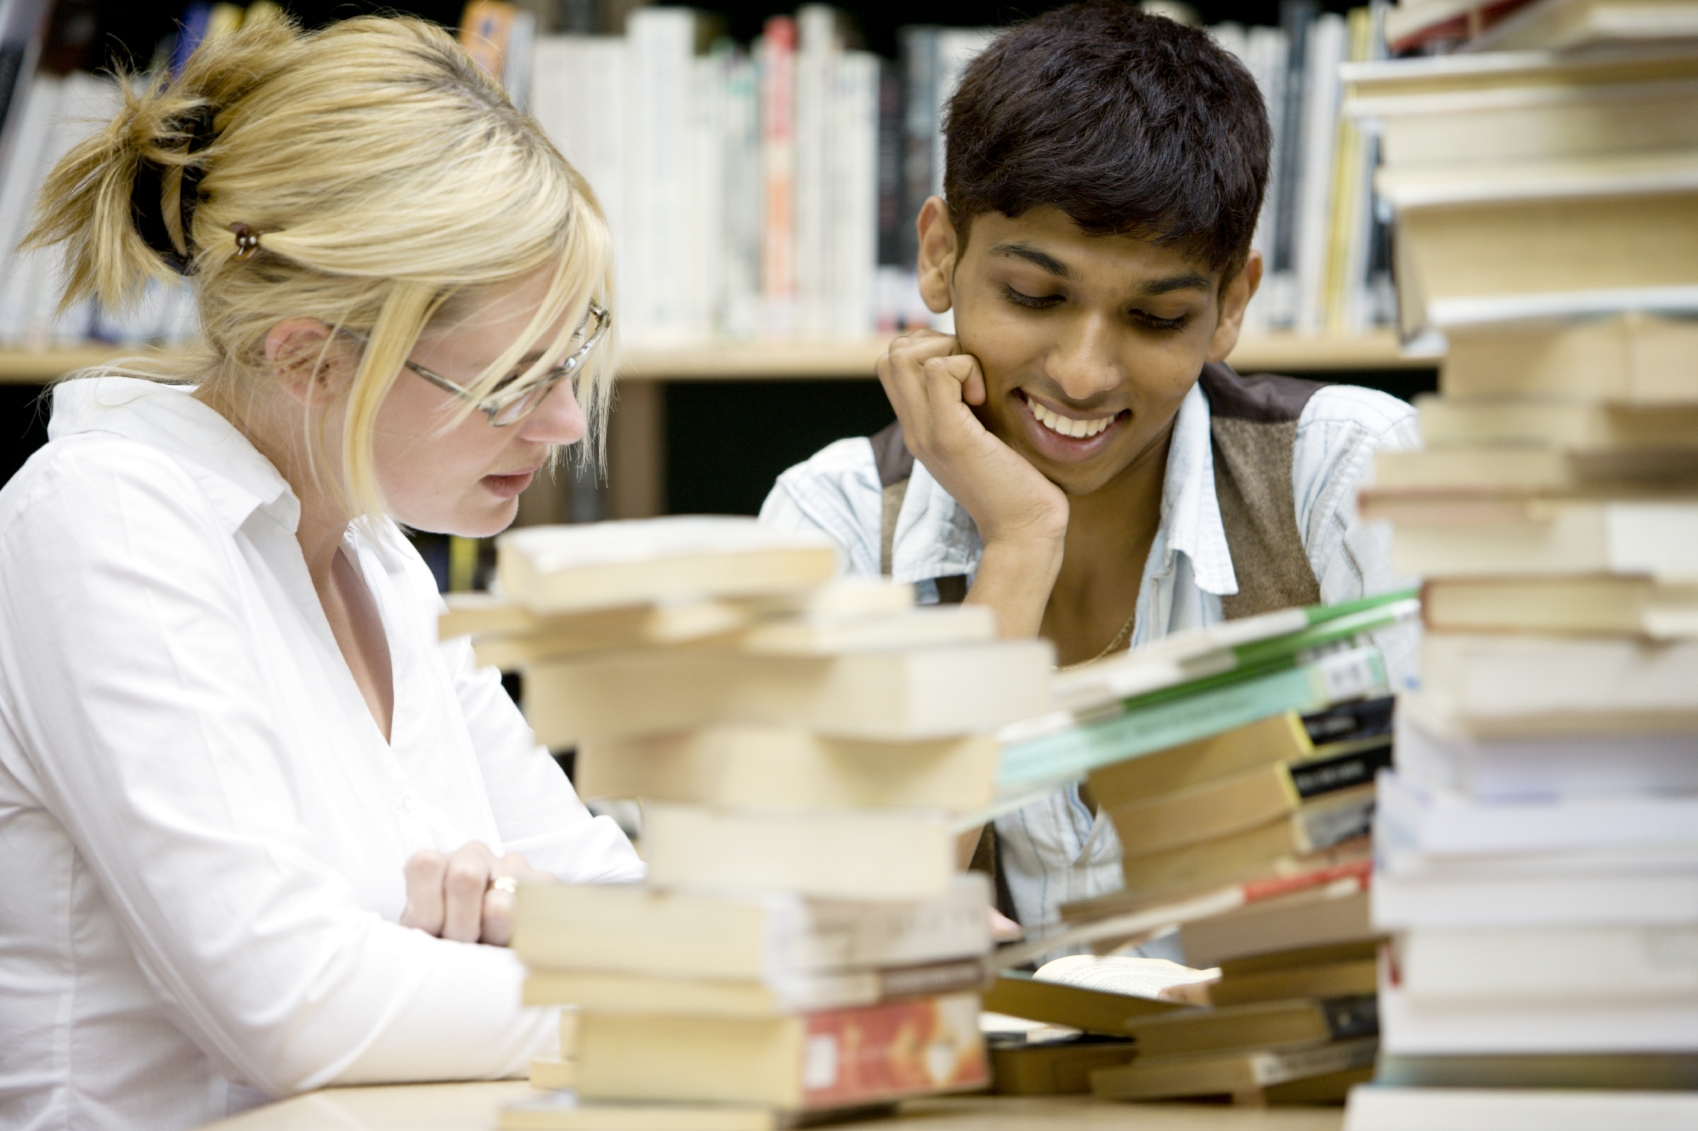 tutoring, raising children, study, studying, study tips